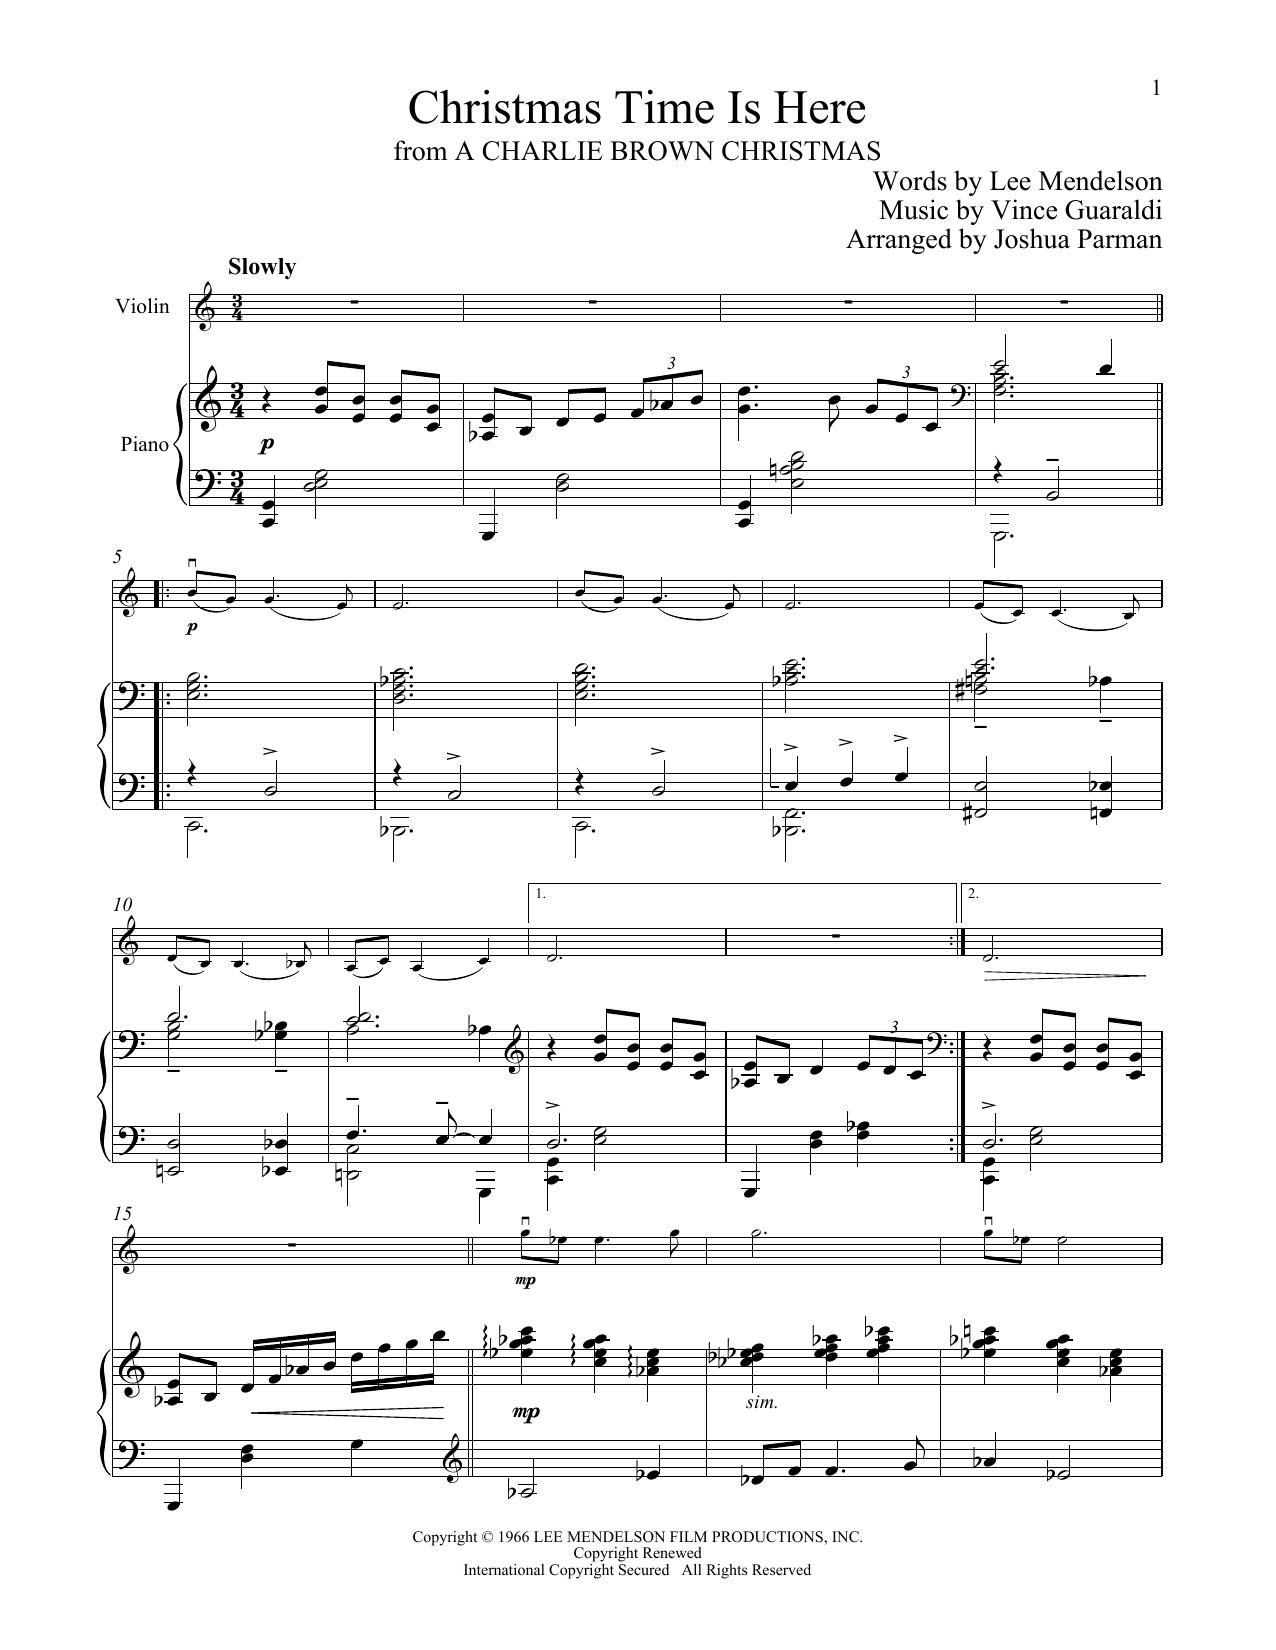 Christmas Time Is Here Chords.Vince Guaraldi Christmas Time Is Here Sheet Music Notes Chords Download Printable Violin And Piano Sku 251175